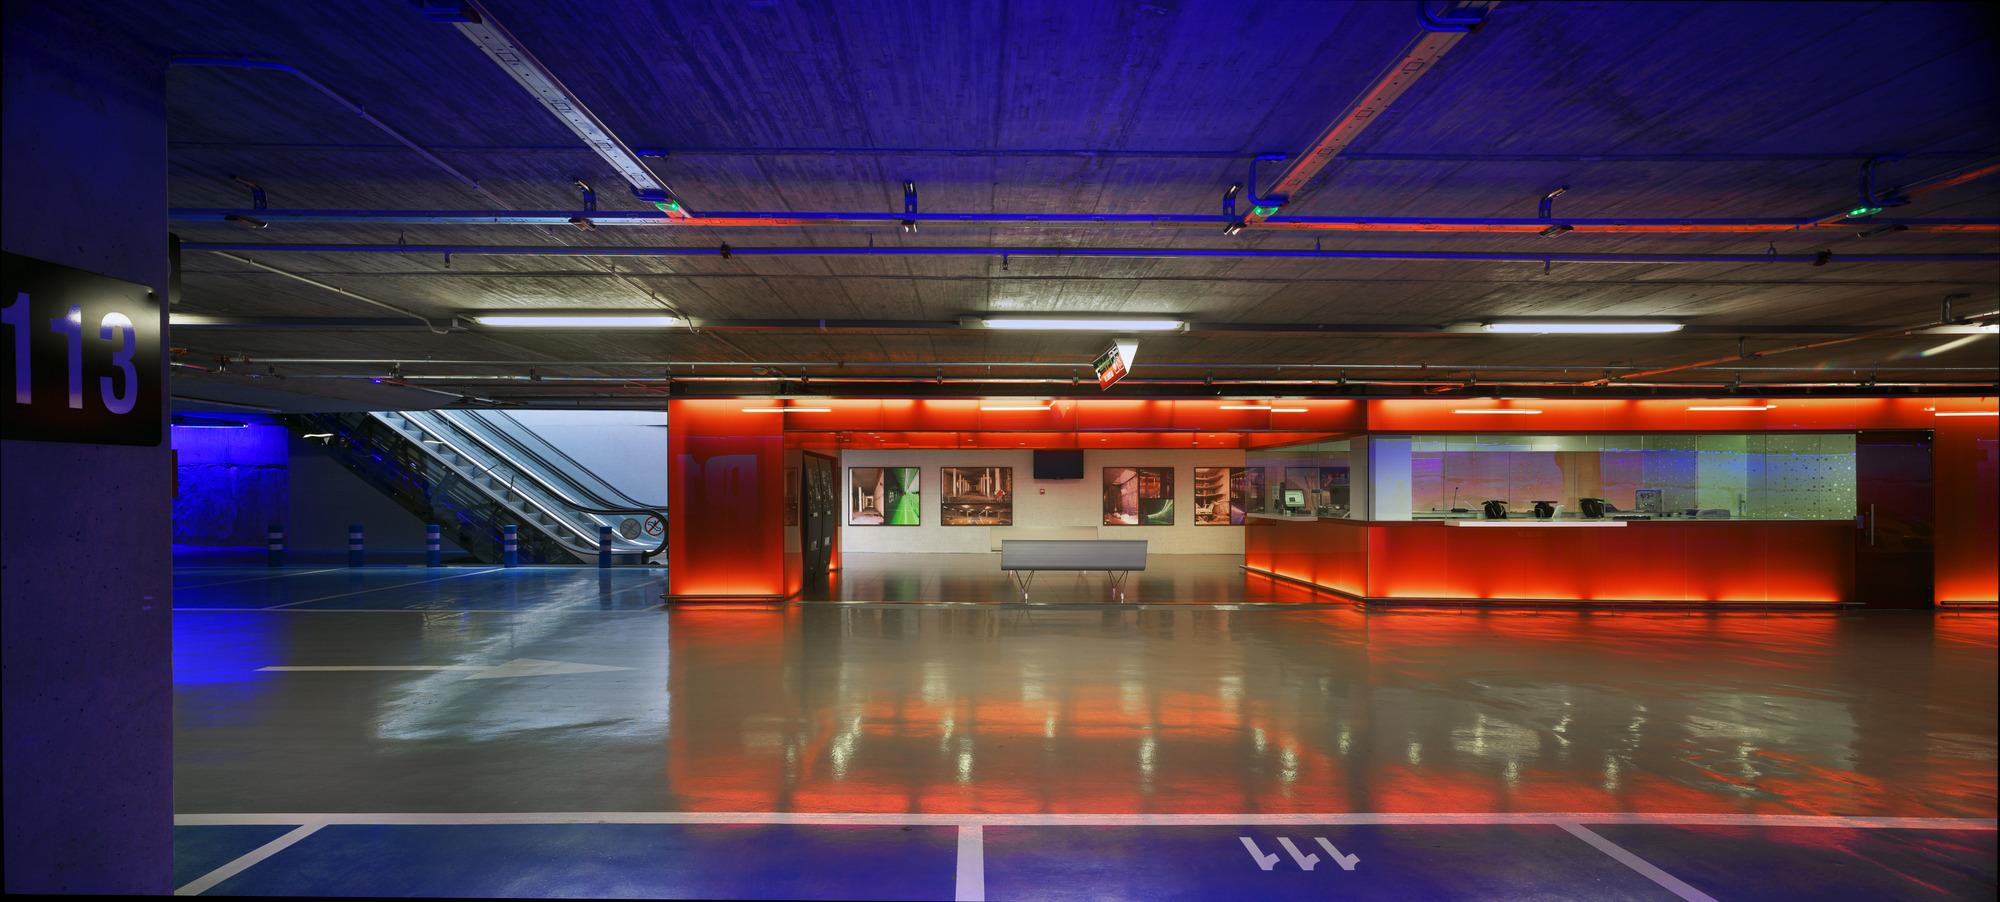 Estacionamentos Avenida Libertad / Clavel Arquitectos, © David Frutos